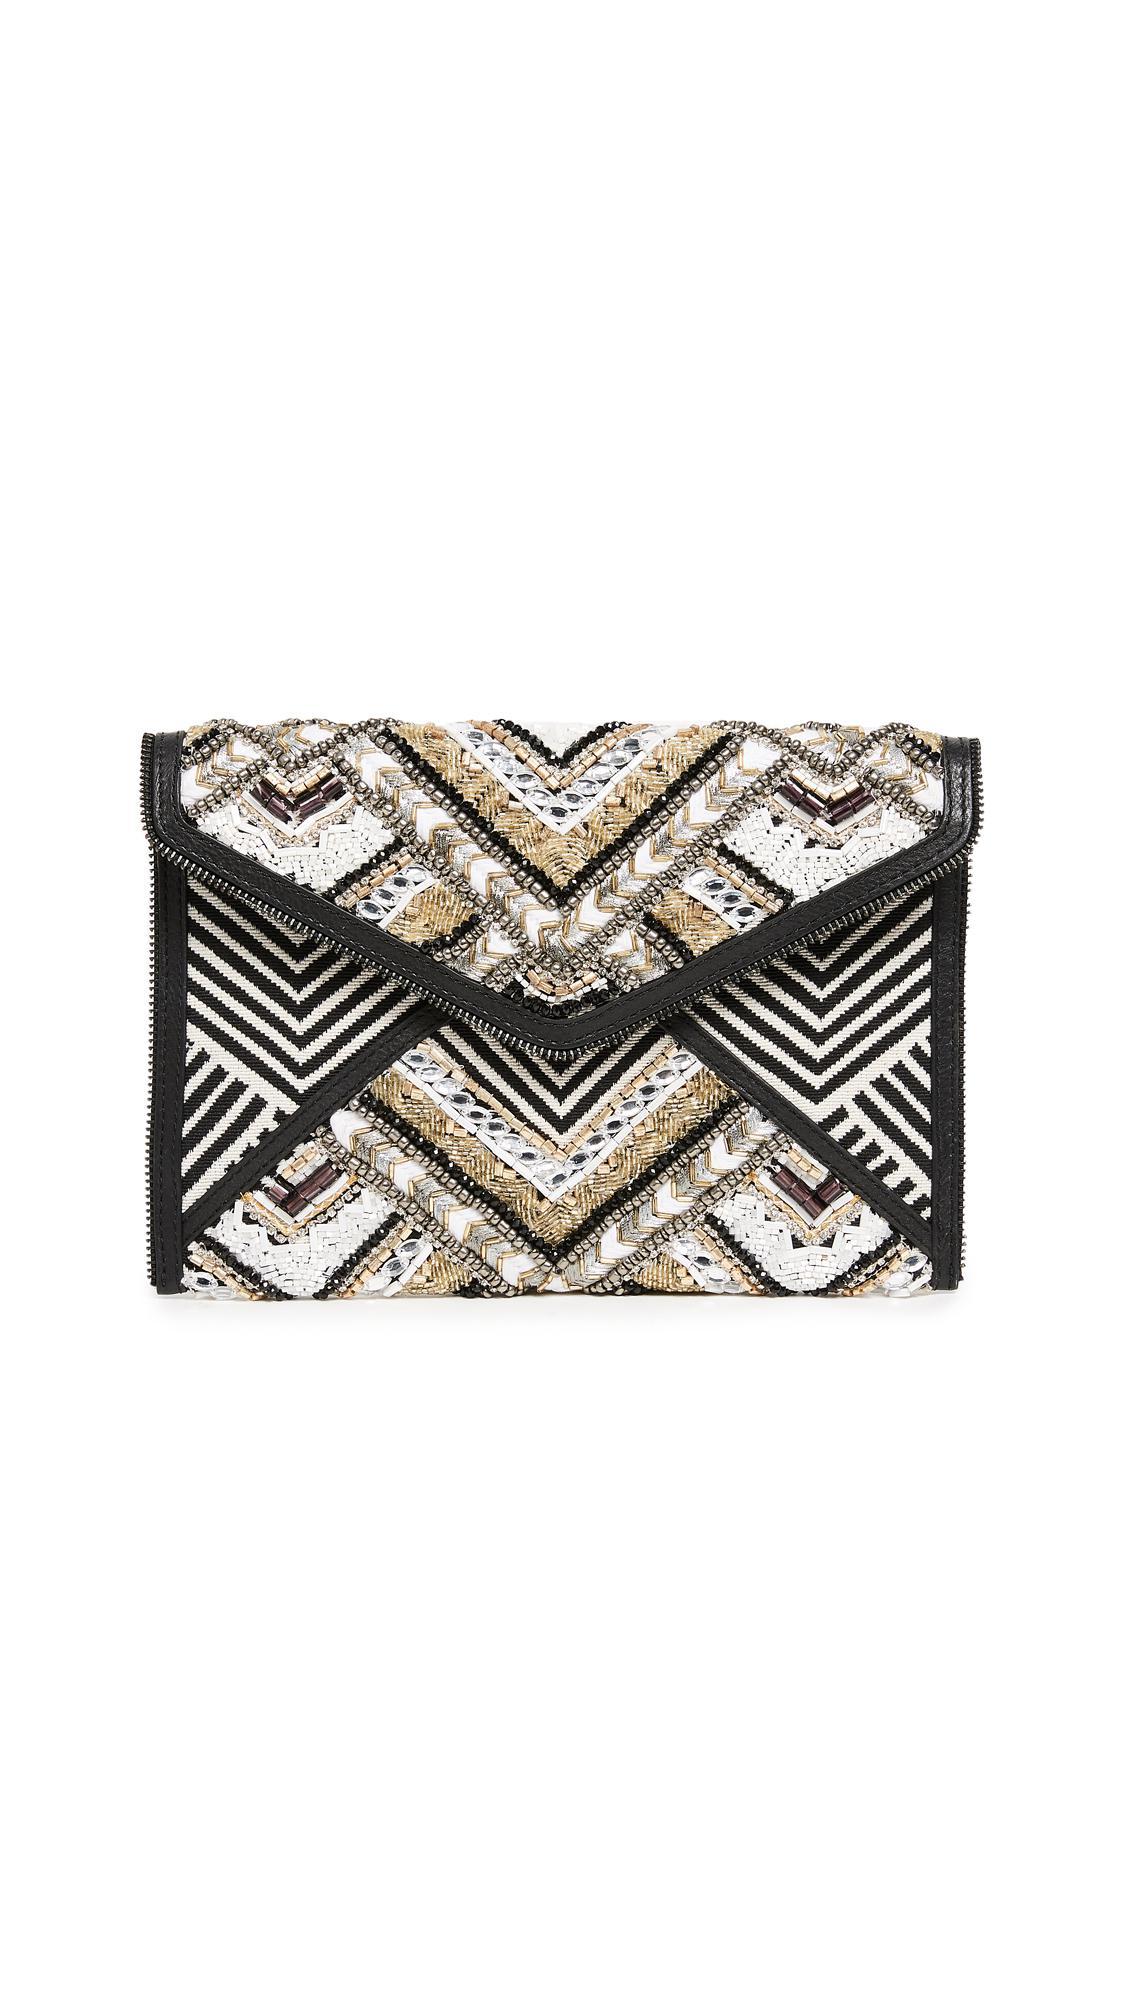 Rebecca Minkoff Leo Beaded Clutch Bag 5wfADajE4